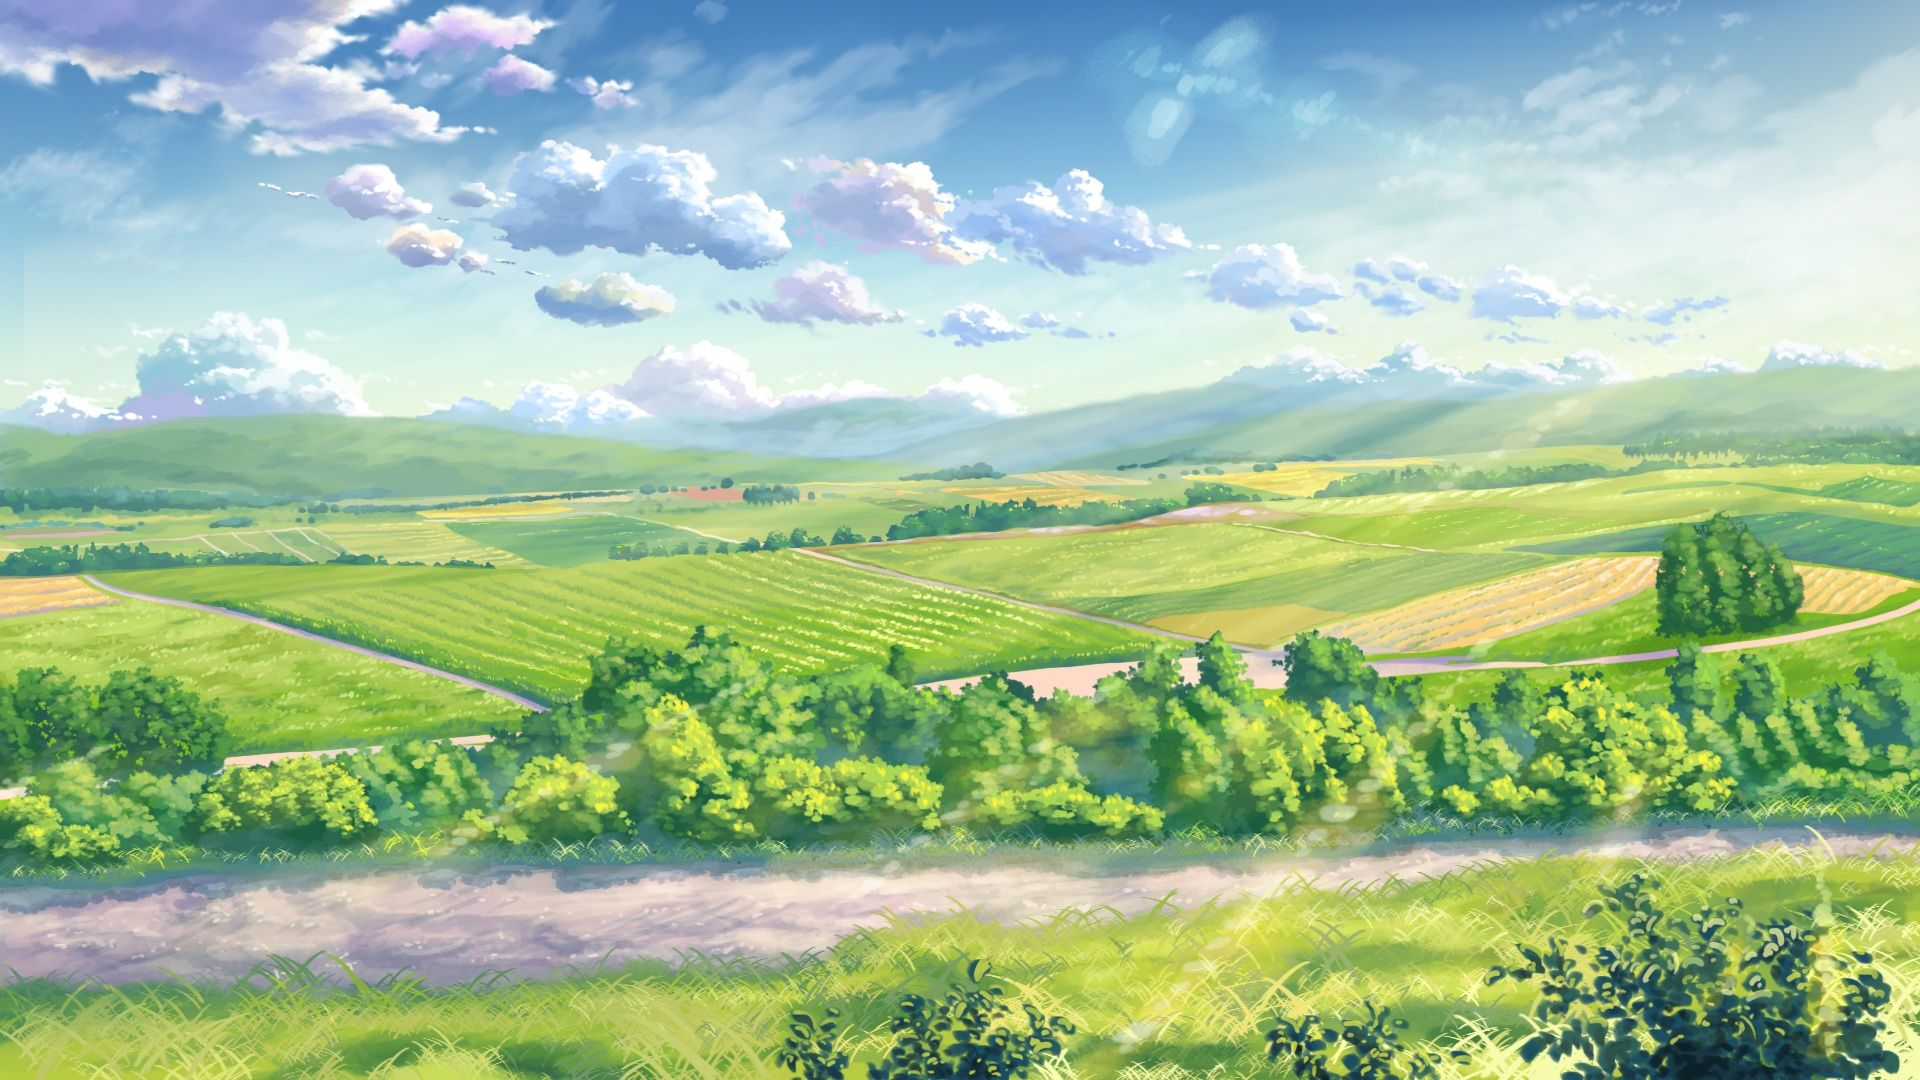 Green Anime Landscape Wallpaper